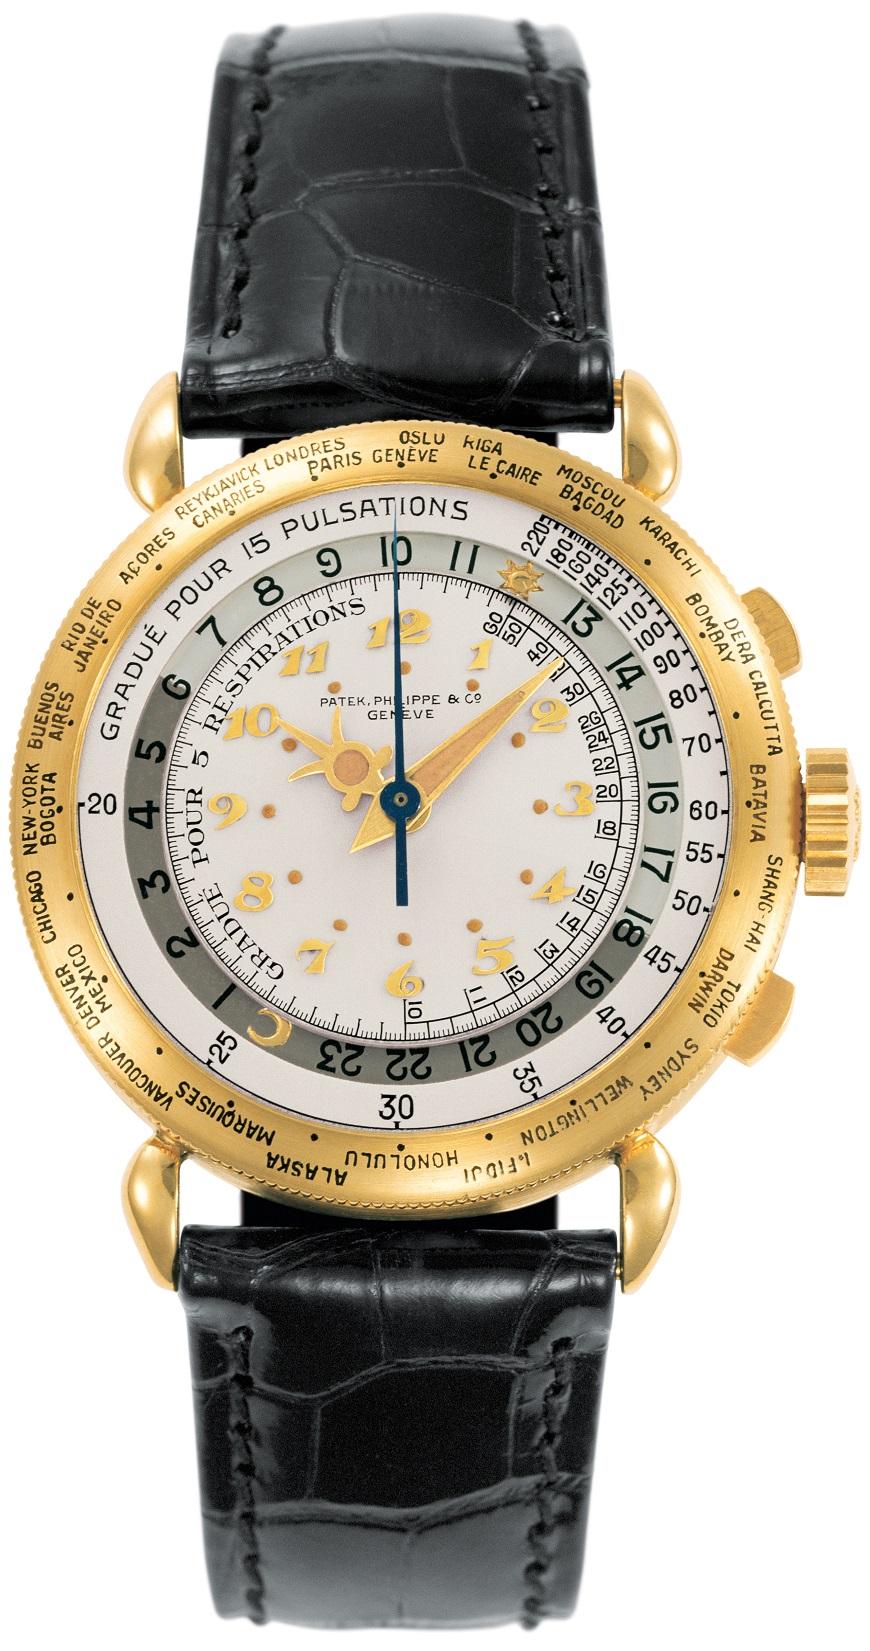 De 1940 Patek Philippe World Time Chronograph